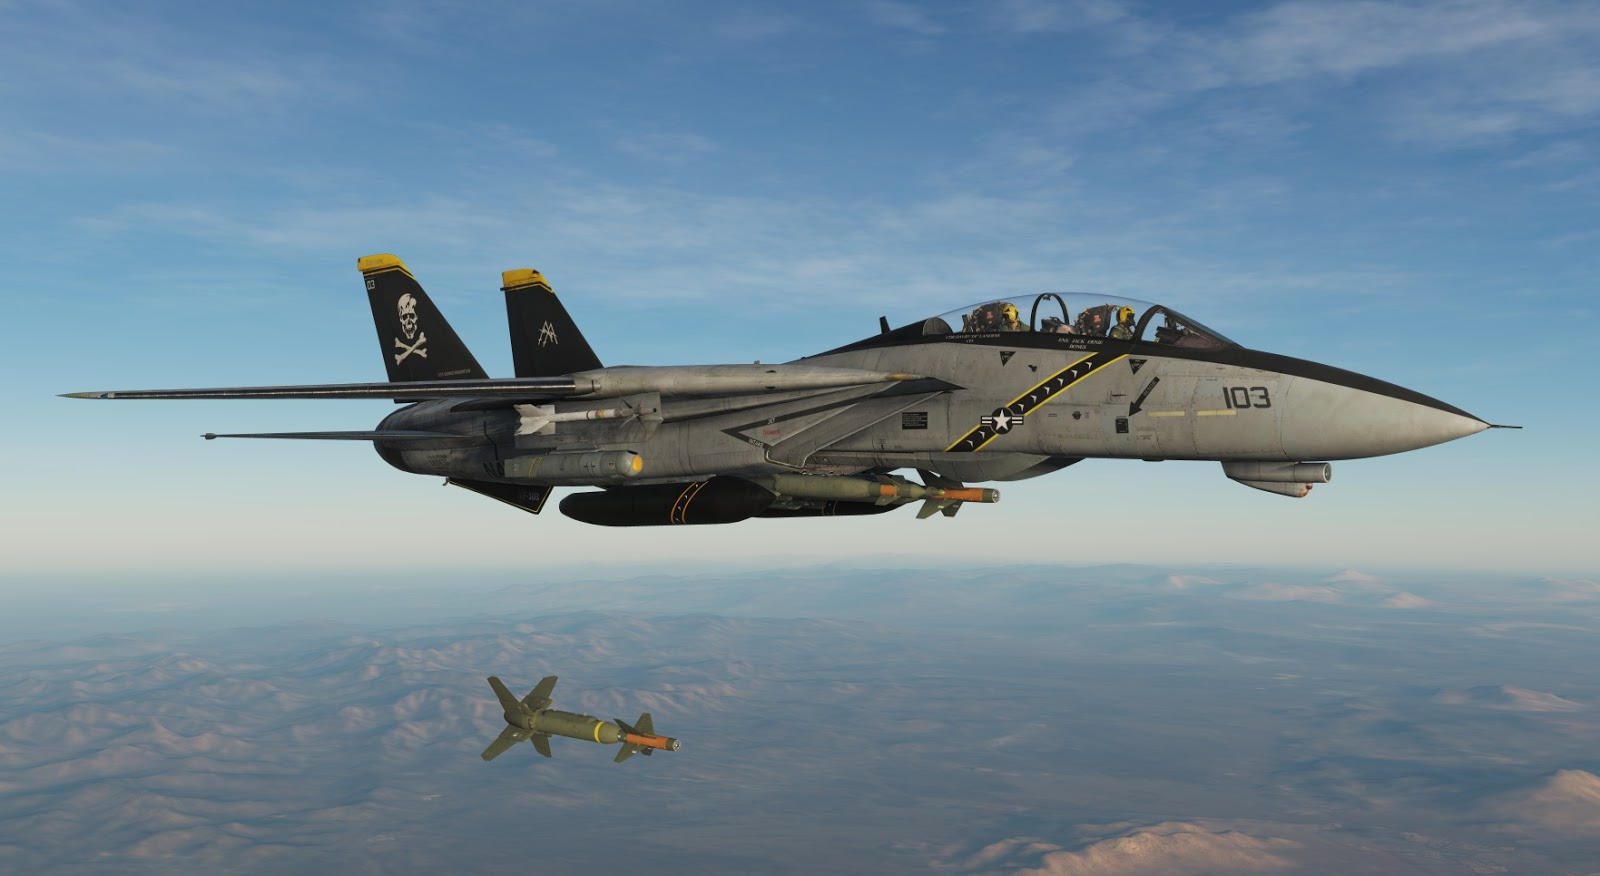 Sharp Wings: DCS: F-14 Tomcat